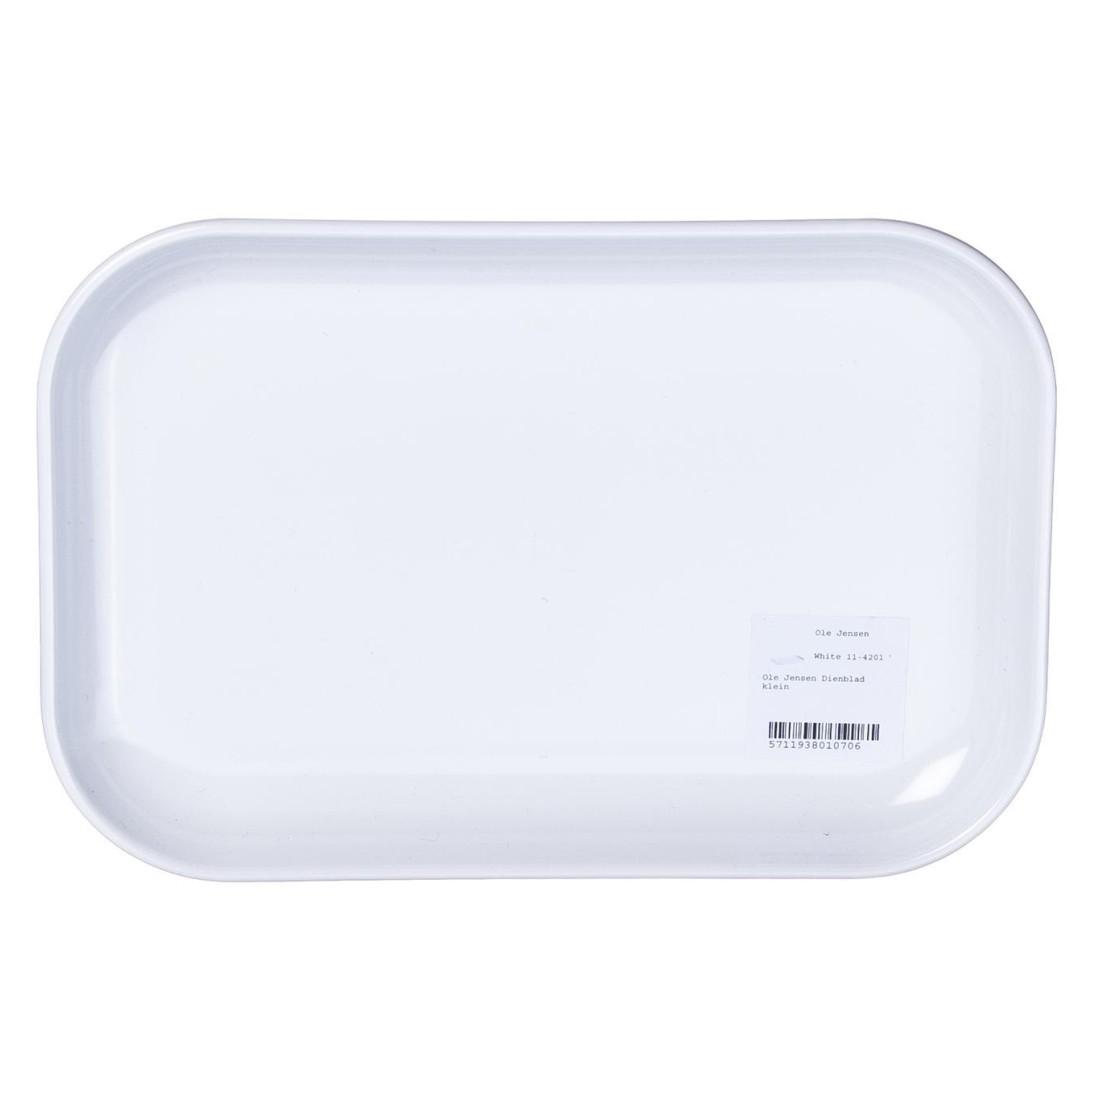 Tablett Mia – Melamin – Weiß – 2 x 16 x 23 cm, Ole Jensen jetzt kaufen